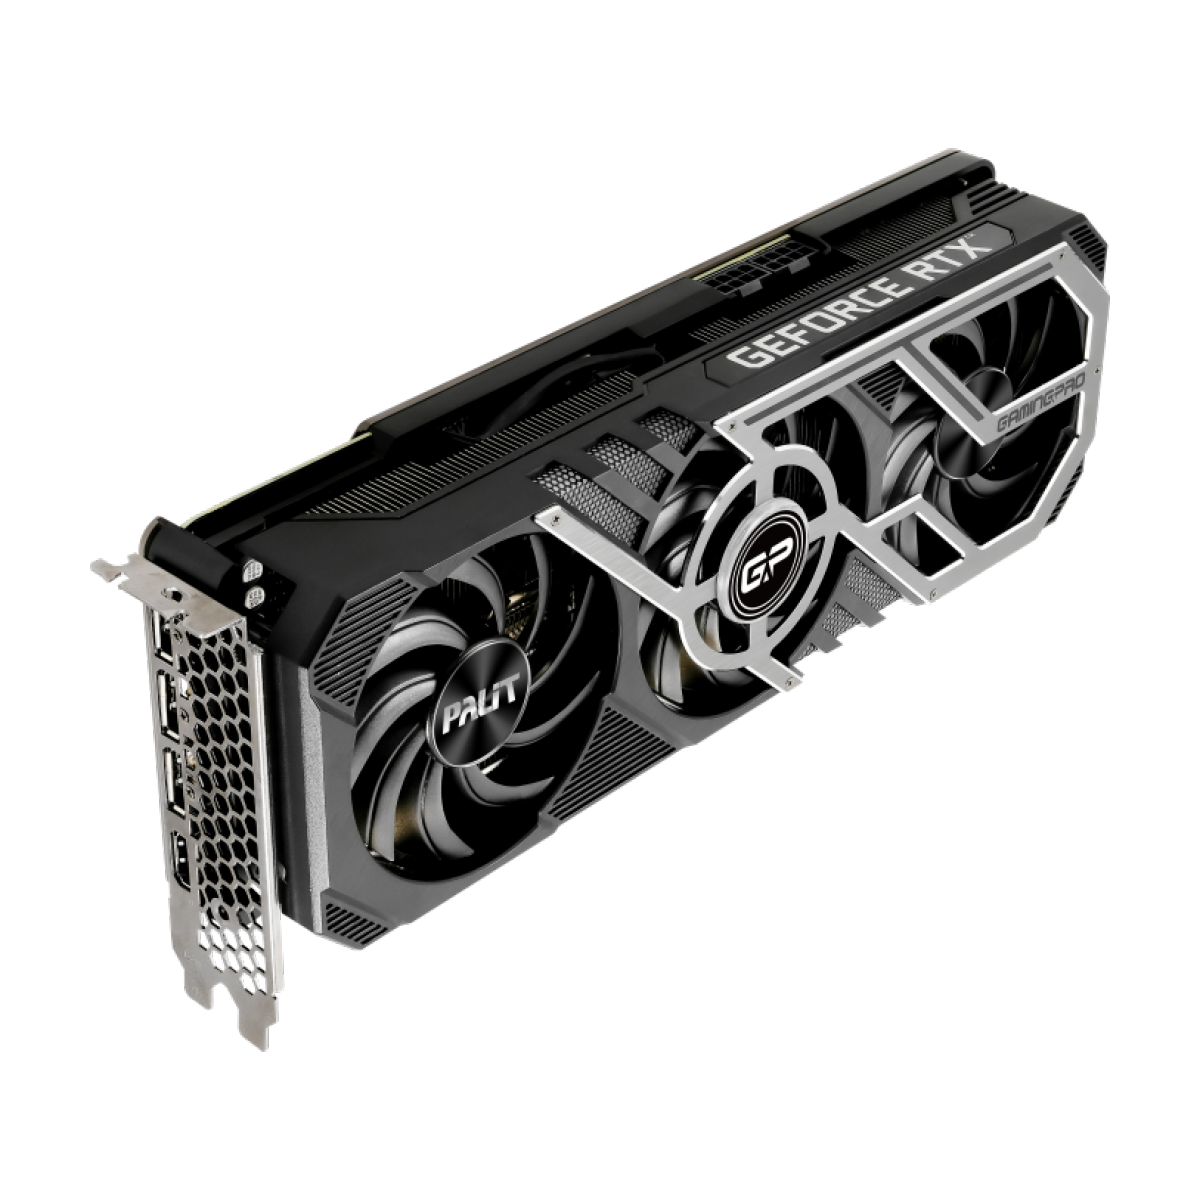 Placa de Vídeo Palit NVIDIA GeForce RTX 3080 GamingPro OC, 10GB, GDDR6X, 320bit, NED3080S19IA-132AA